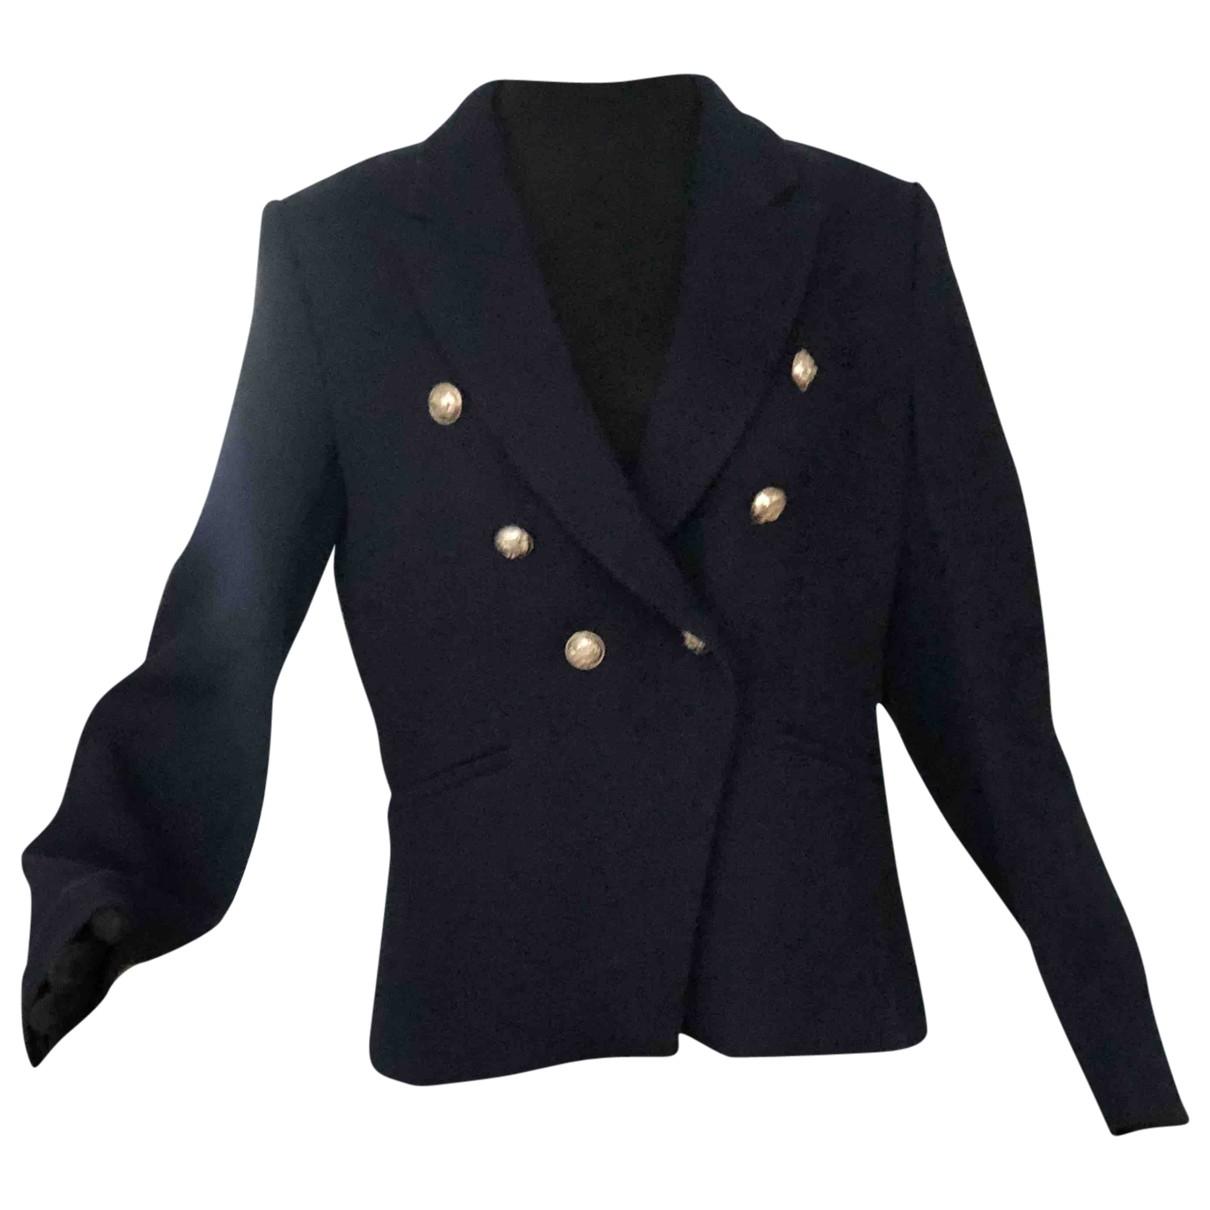 Mango \N Blue Wool jacket for Women XL International